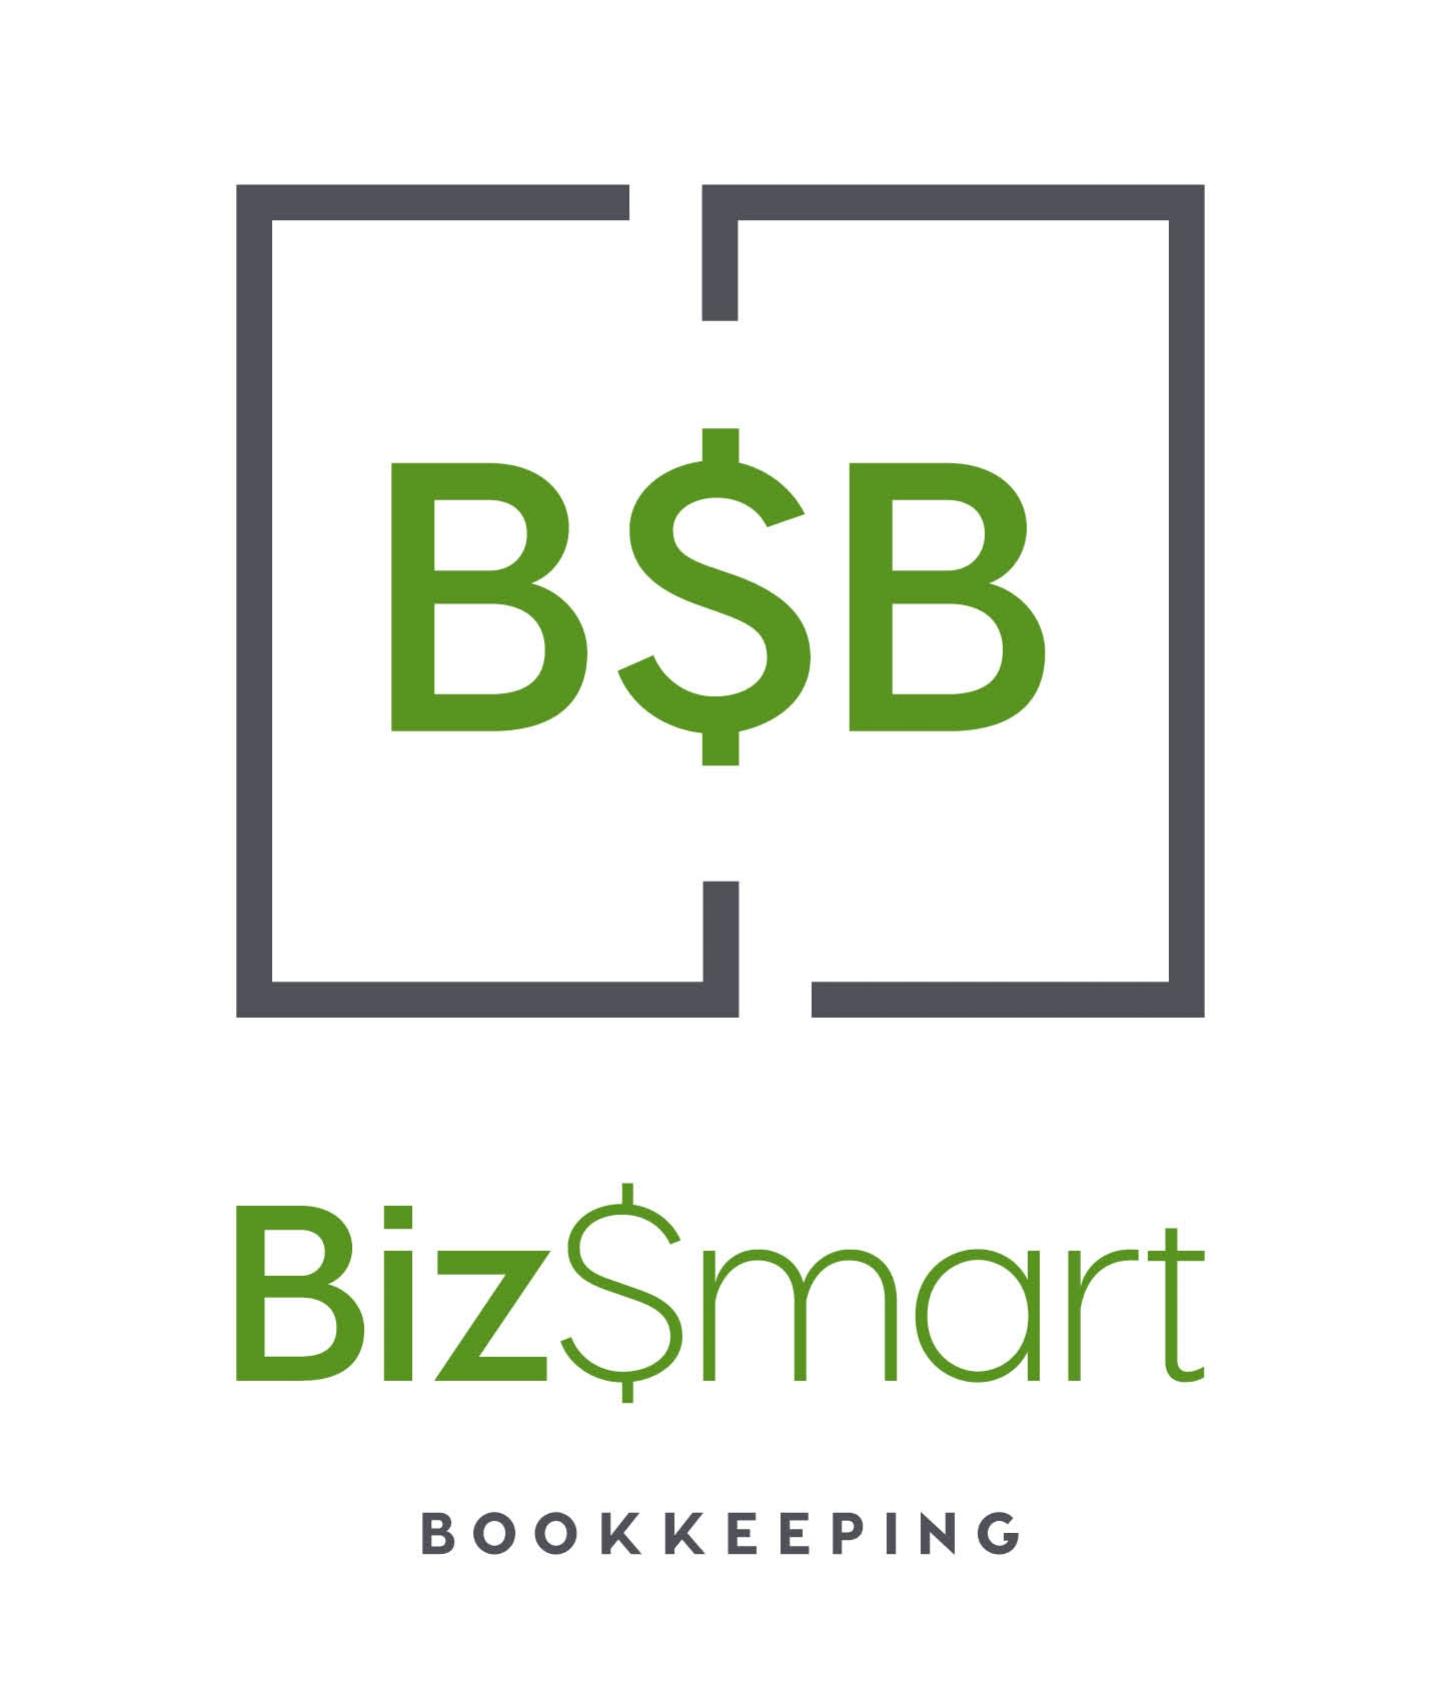 Joanne_Tapodi_Creative_BizSmart_Bookkeeping_Logo.jpg